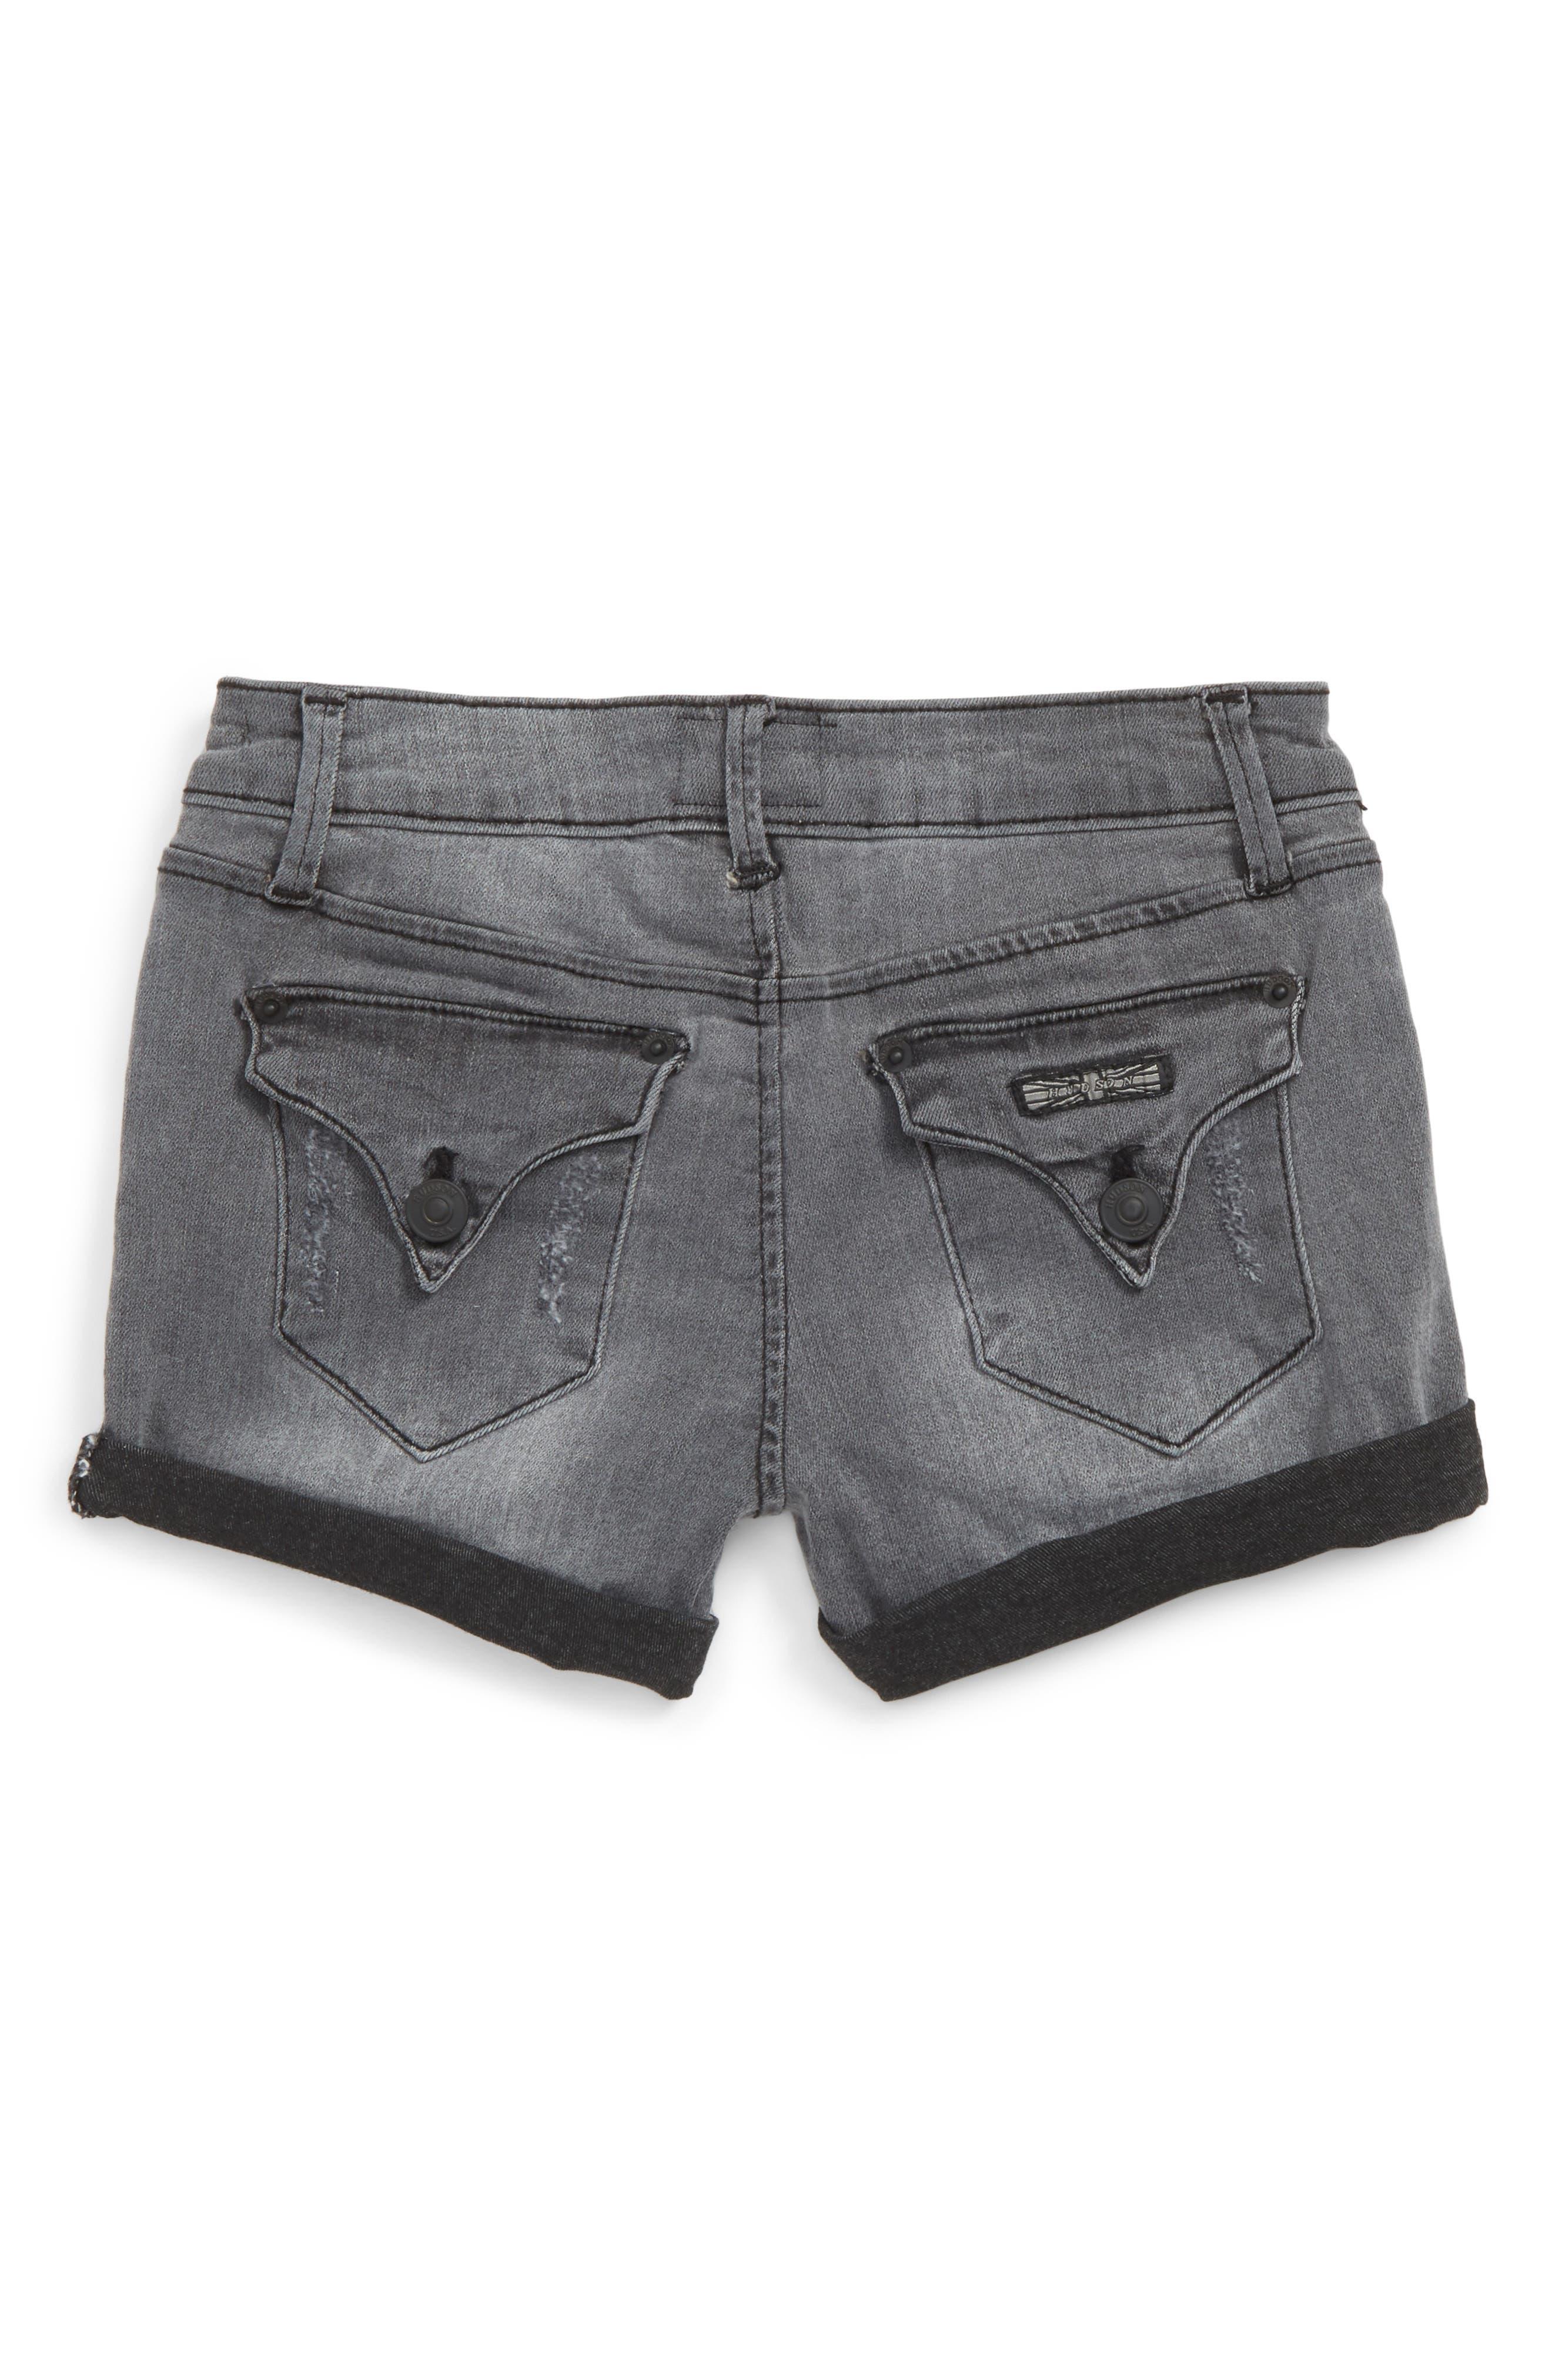 Roll Cuff Denim Shorts,                             Alternate thumbnail 2, color,                             026